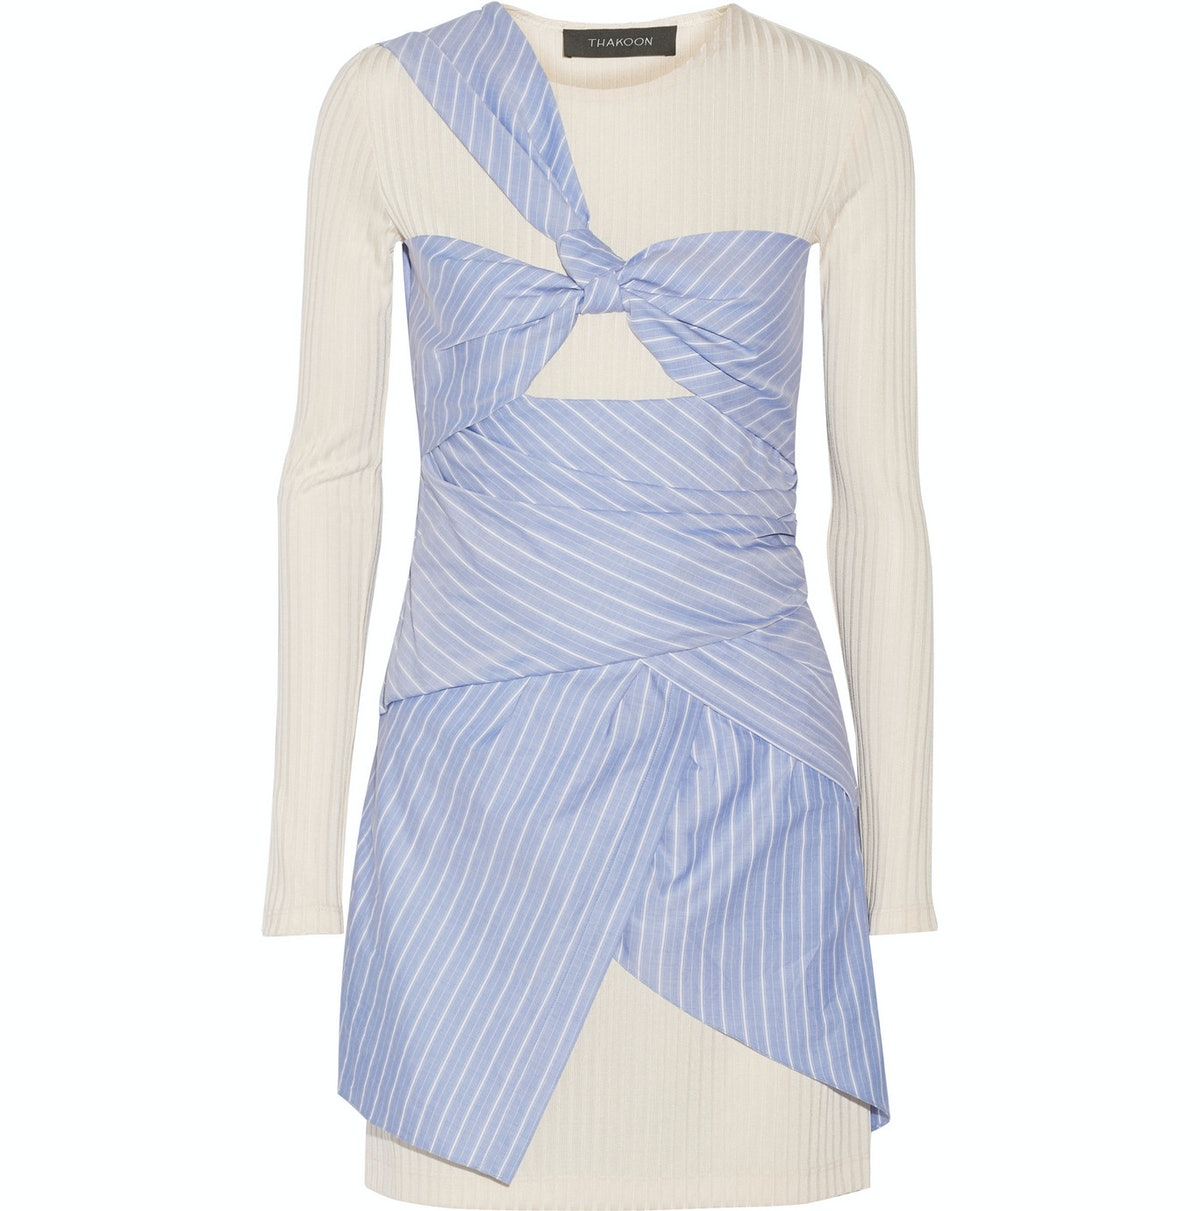 Thakoon dress,